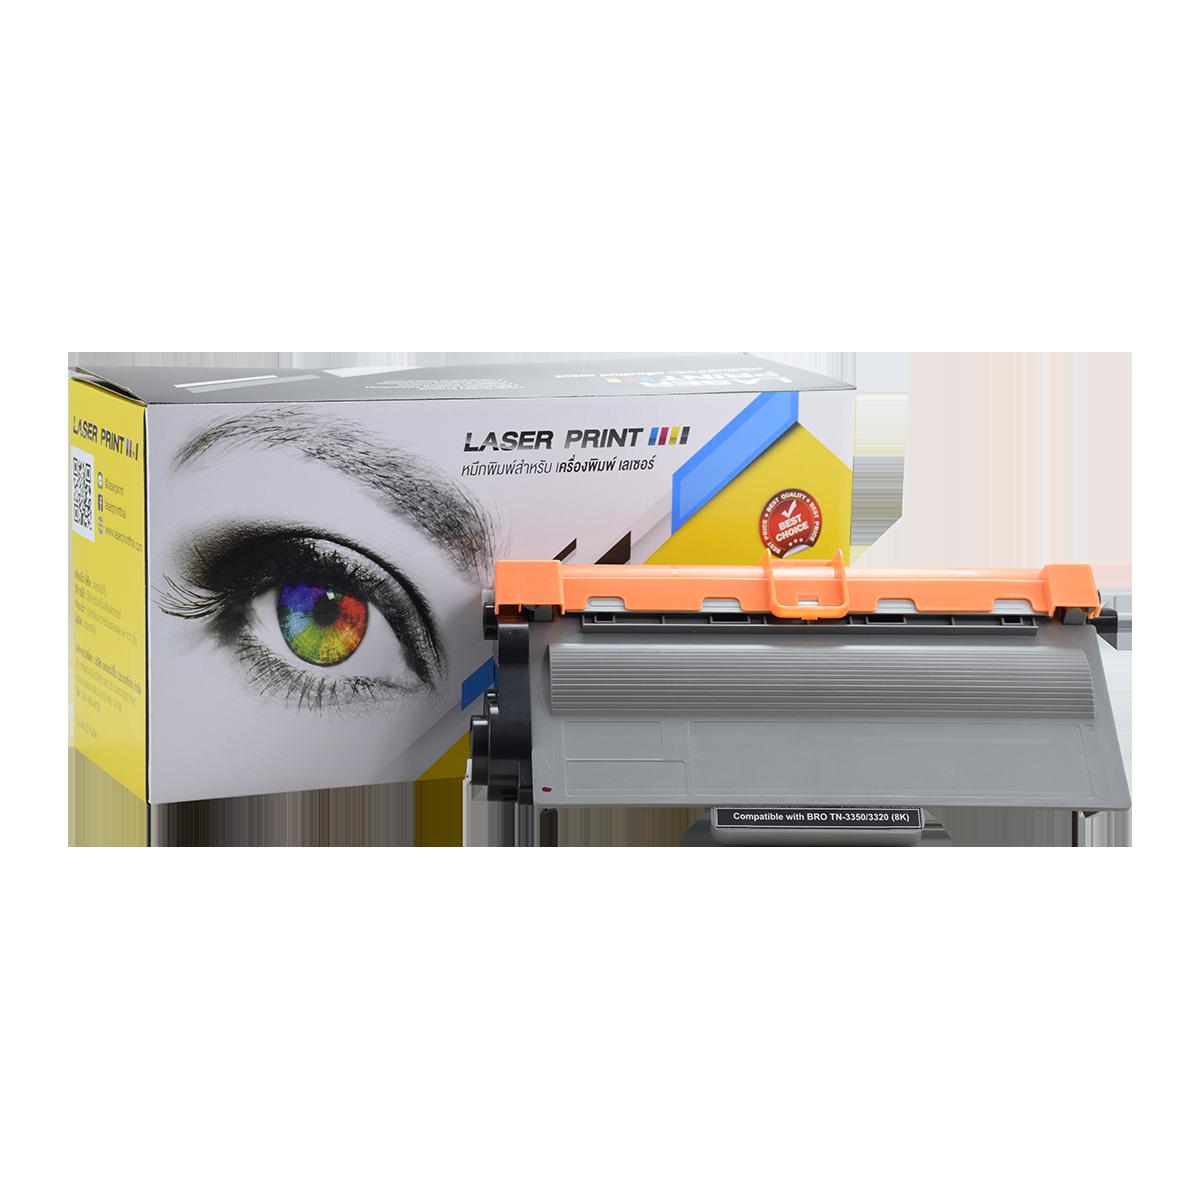 TN-3350/TN-3320 8K Laserprint  BrotherBlack